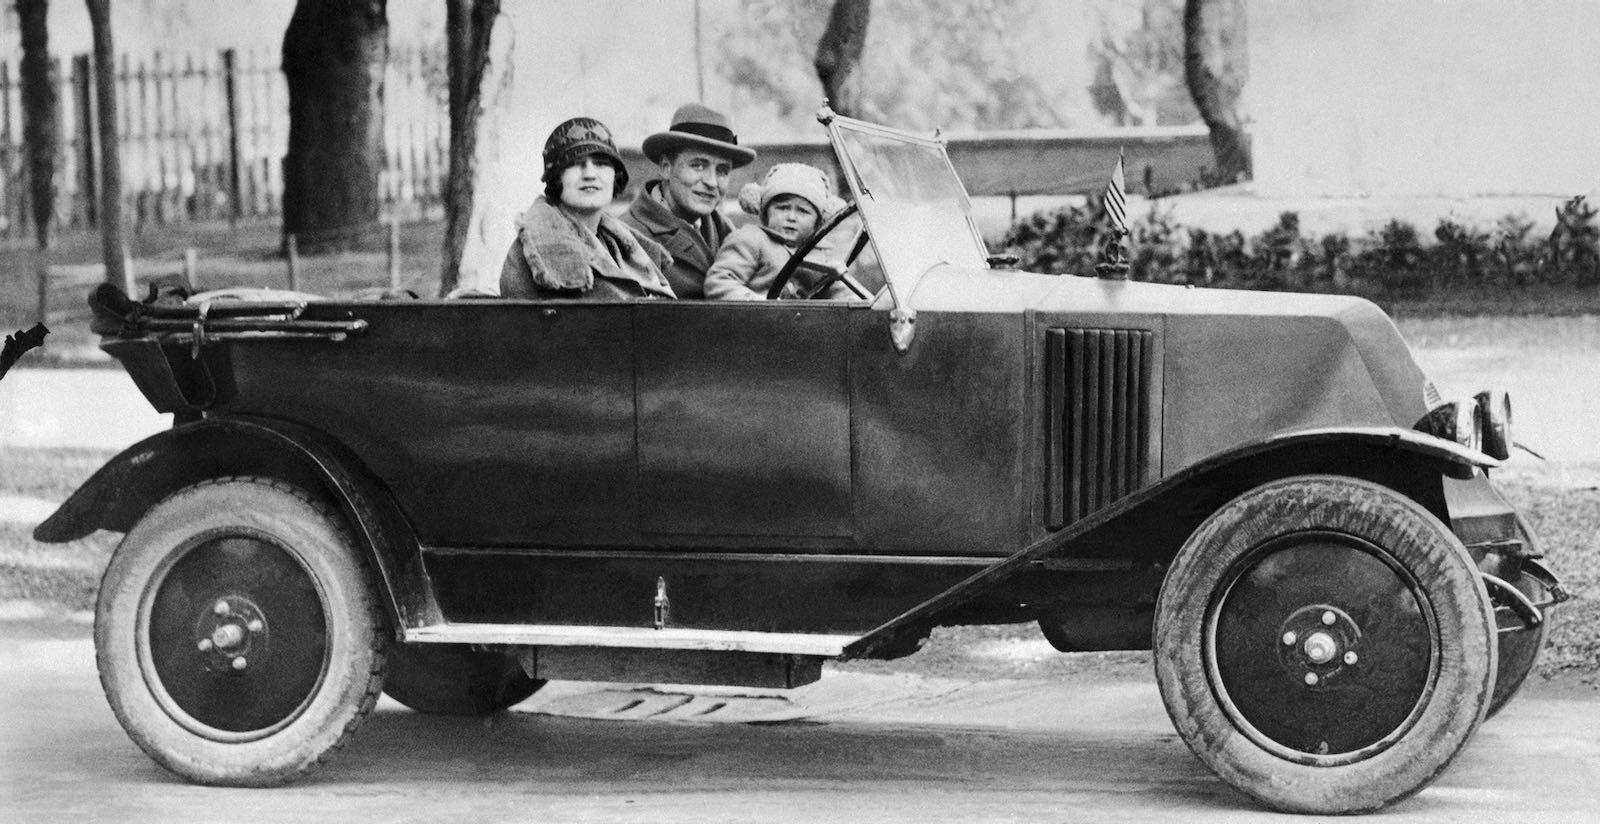 F. Scott Fitzgerald, Zelda, and daughter Scottie in an automobile